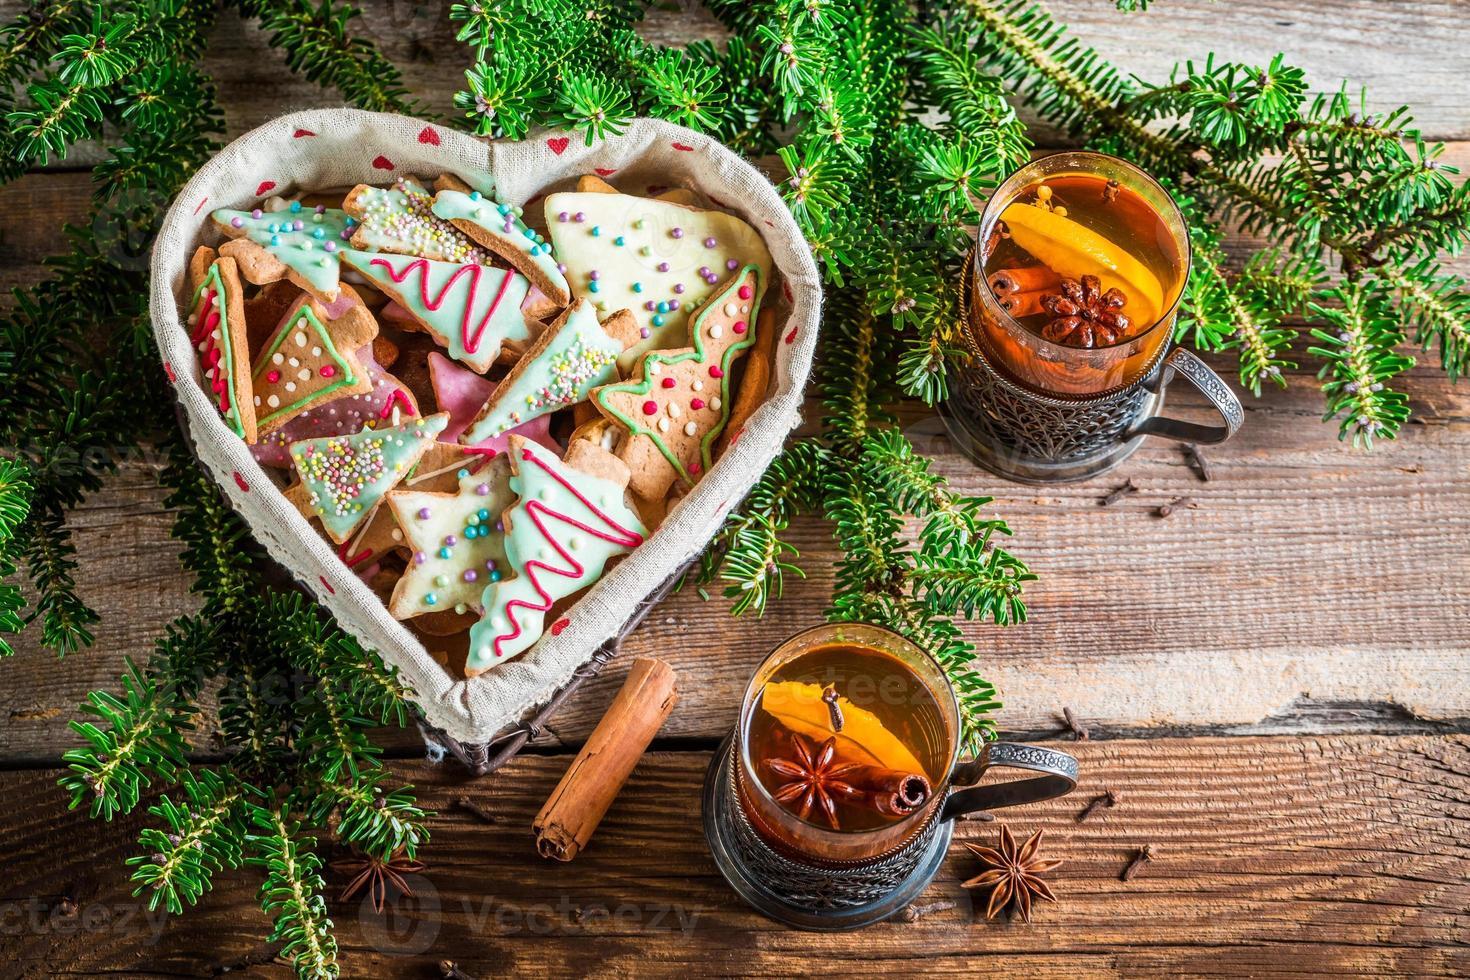 Enjoy your Christmas tea photo